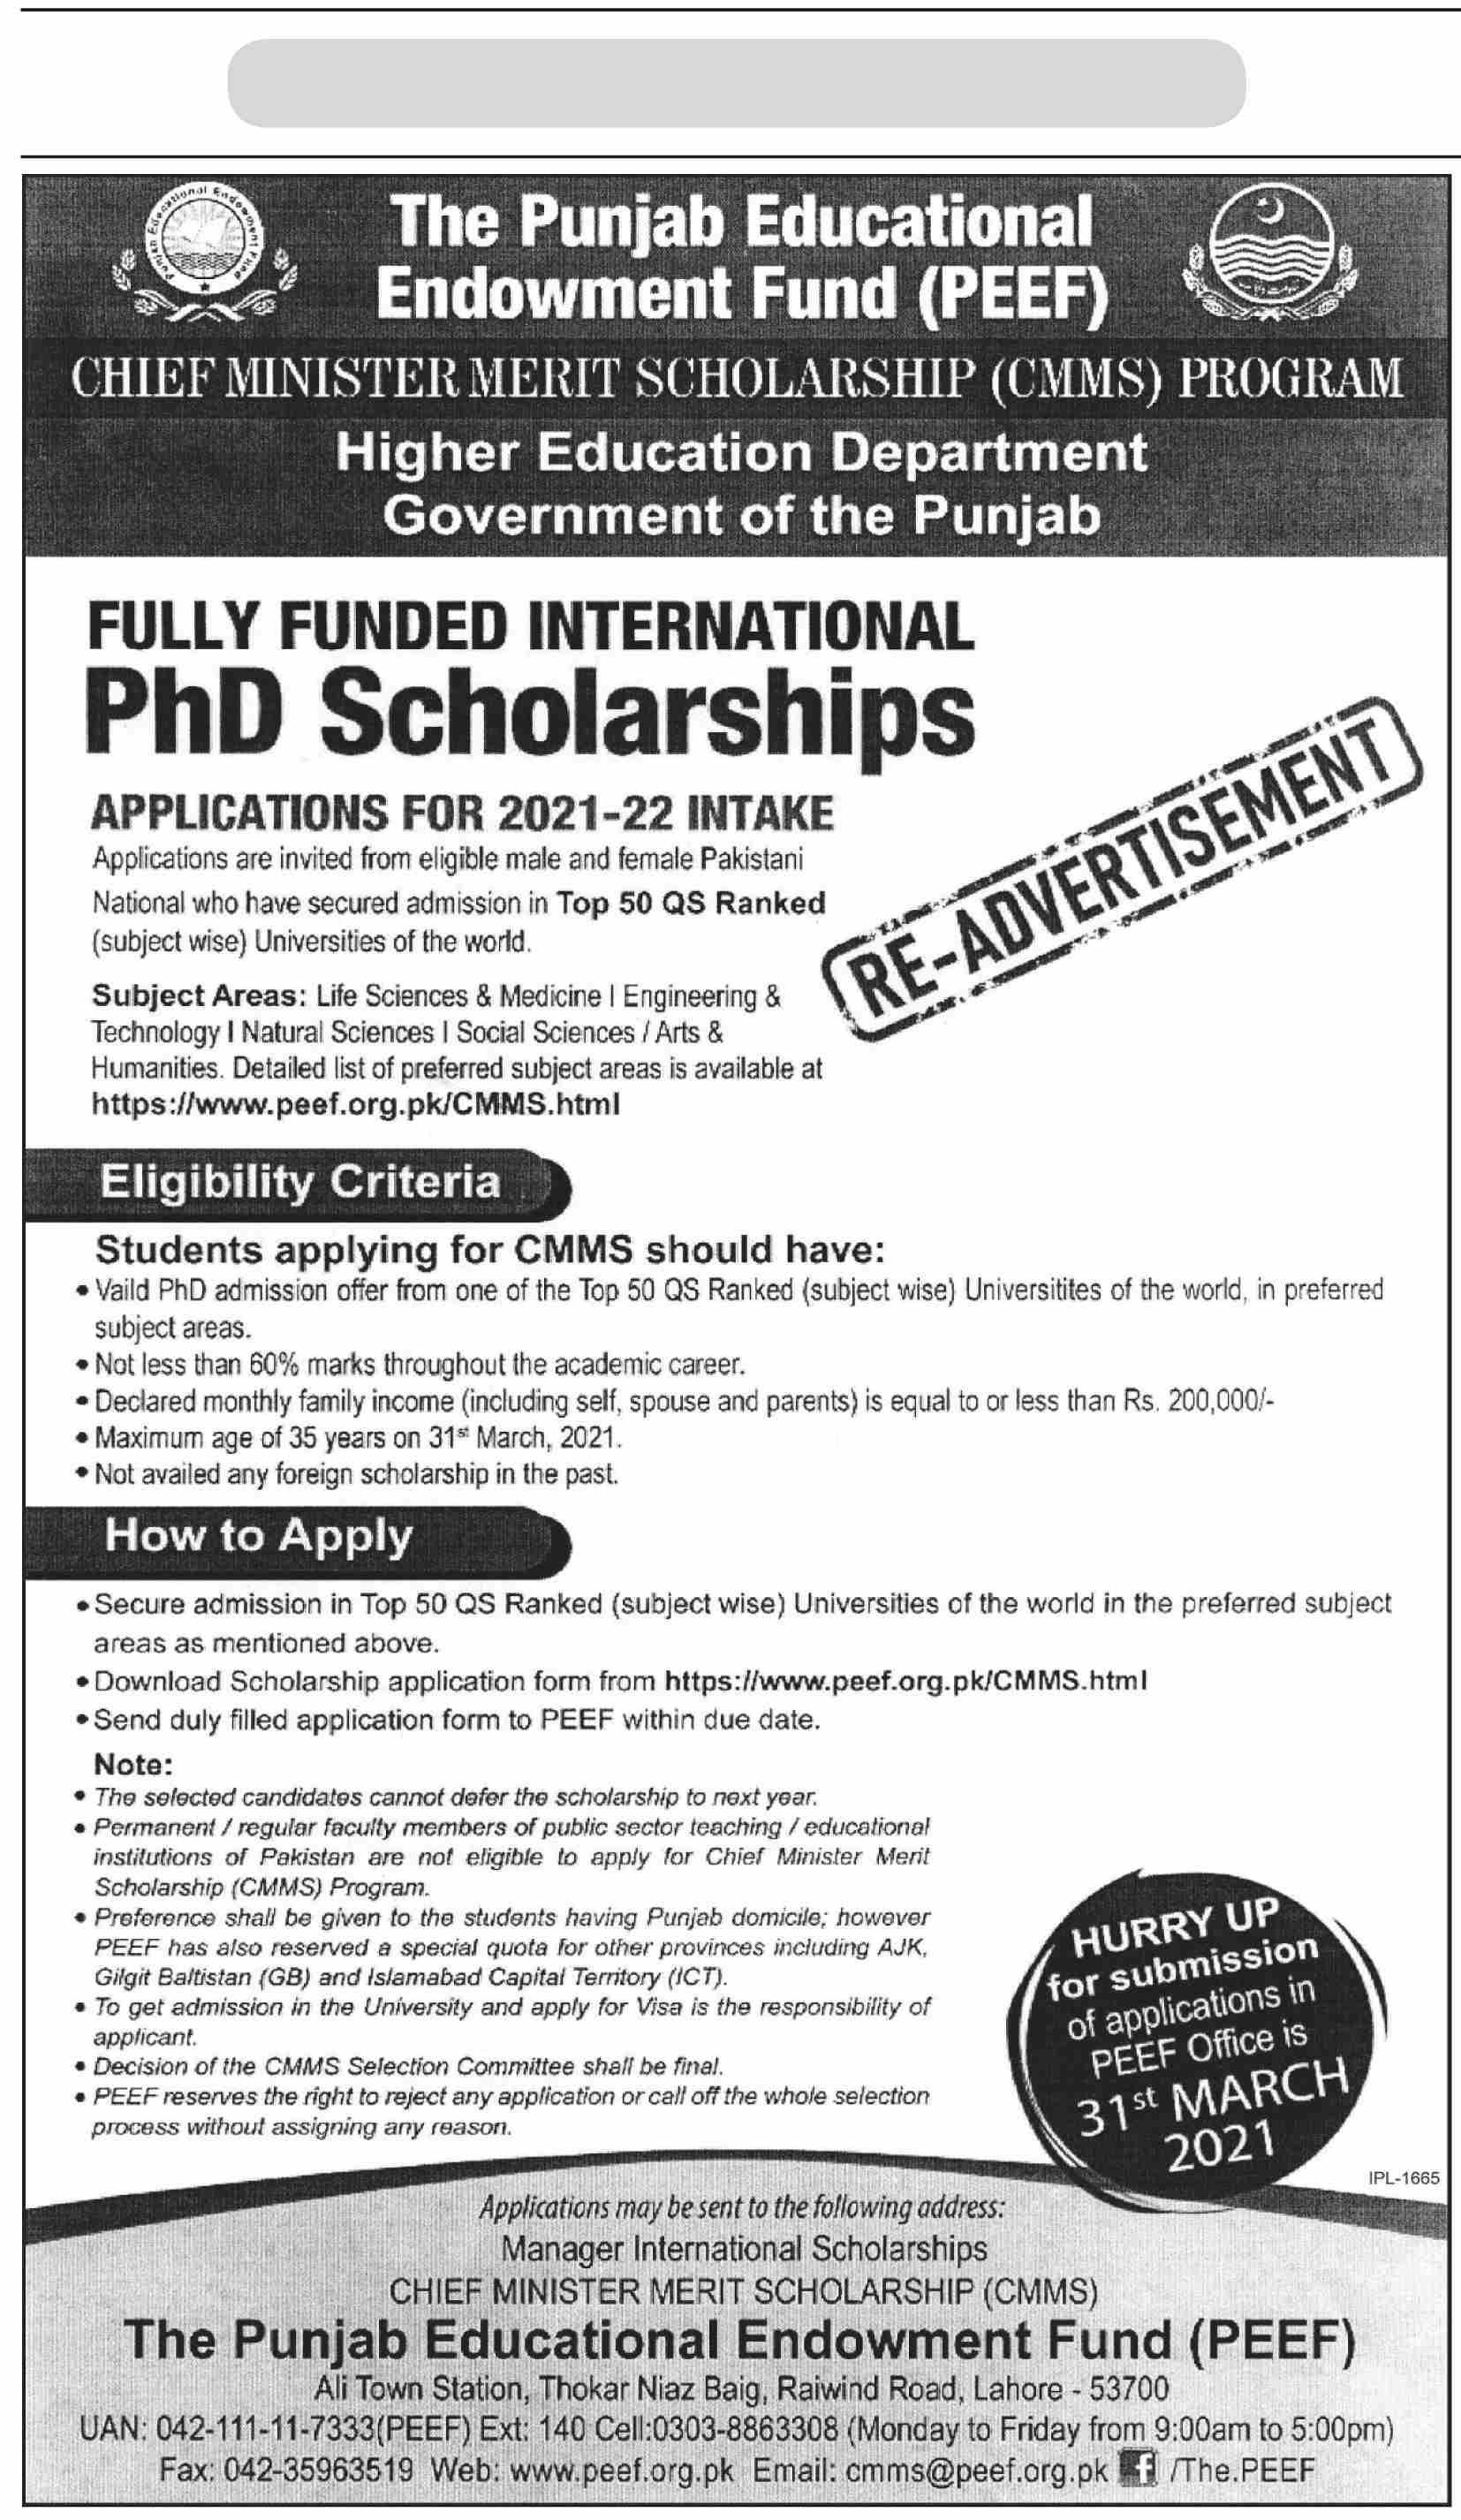 Punjab Educational Endowment Fund PhD Scholarships